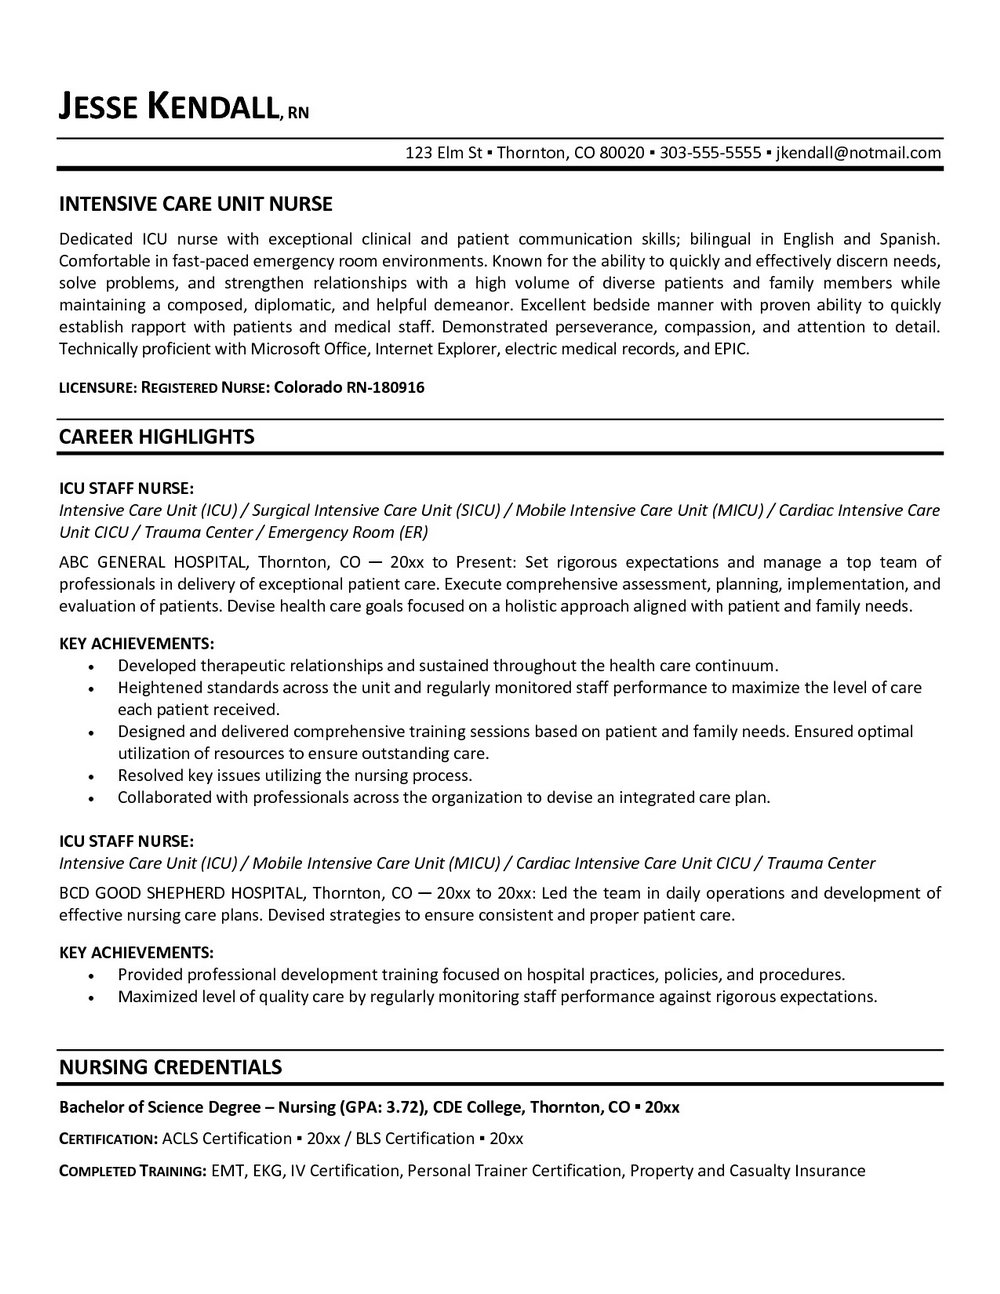 Resume Summary Examples For Nurses